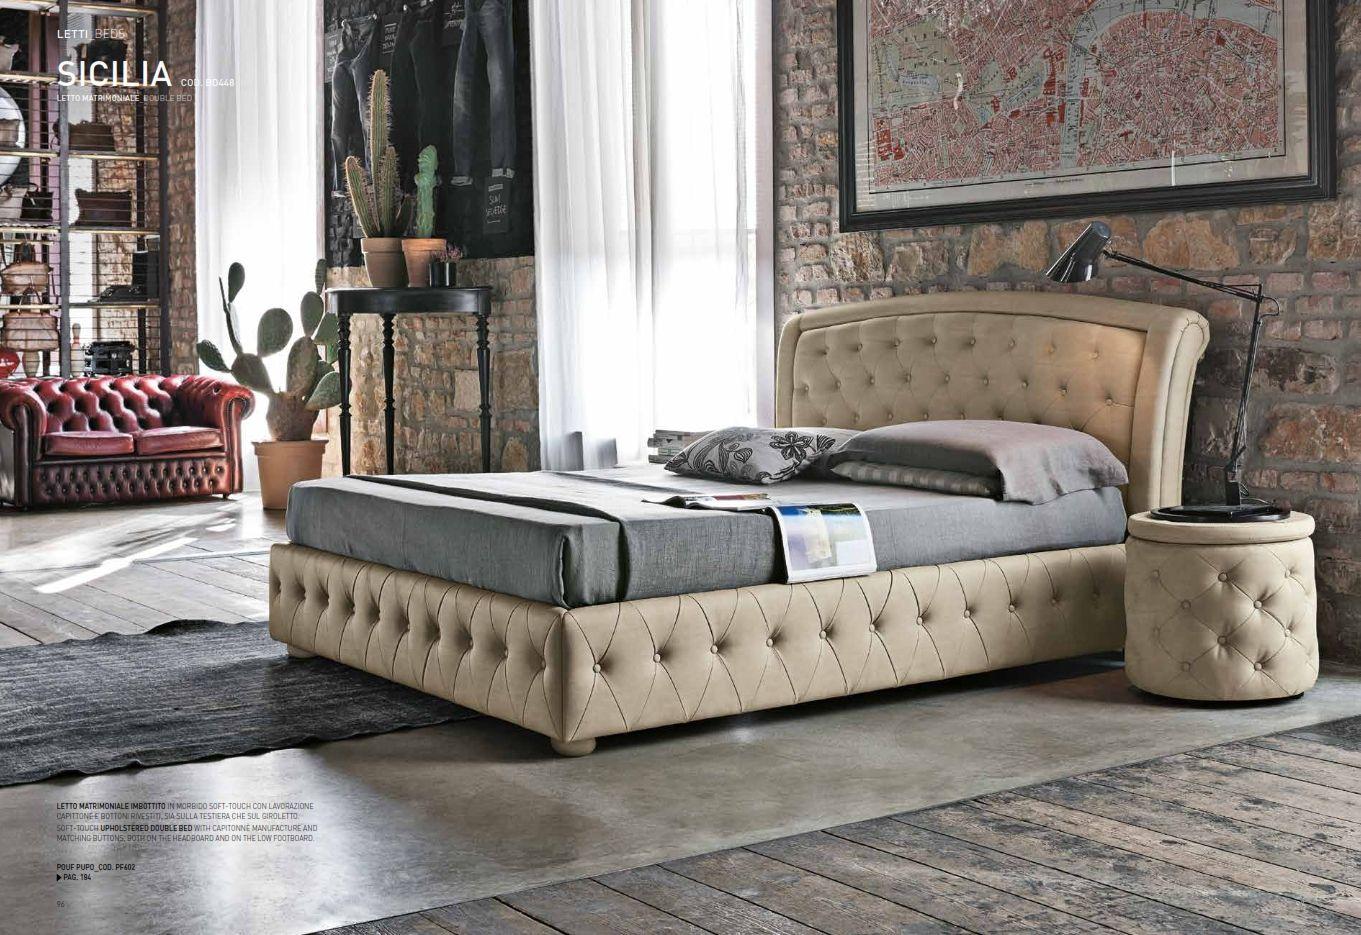 LEATHER BEDROOM - Leather Bedroom Target Point Sicilia ...